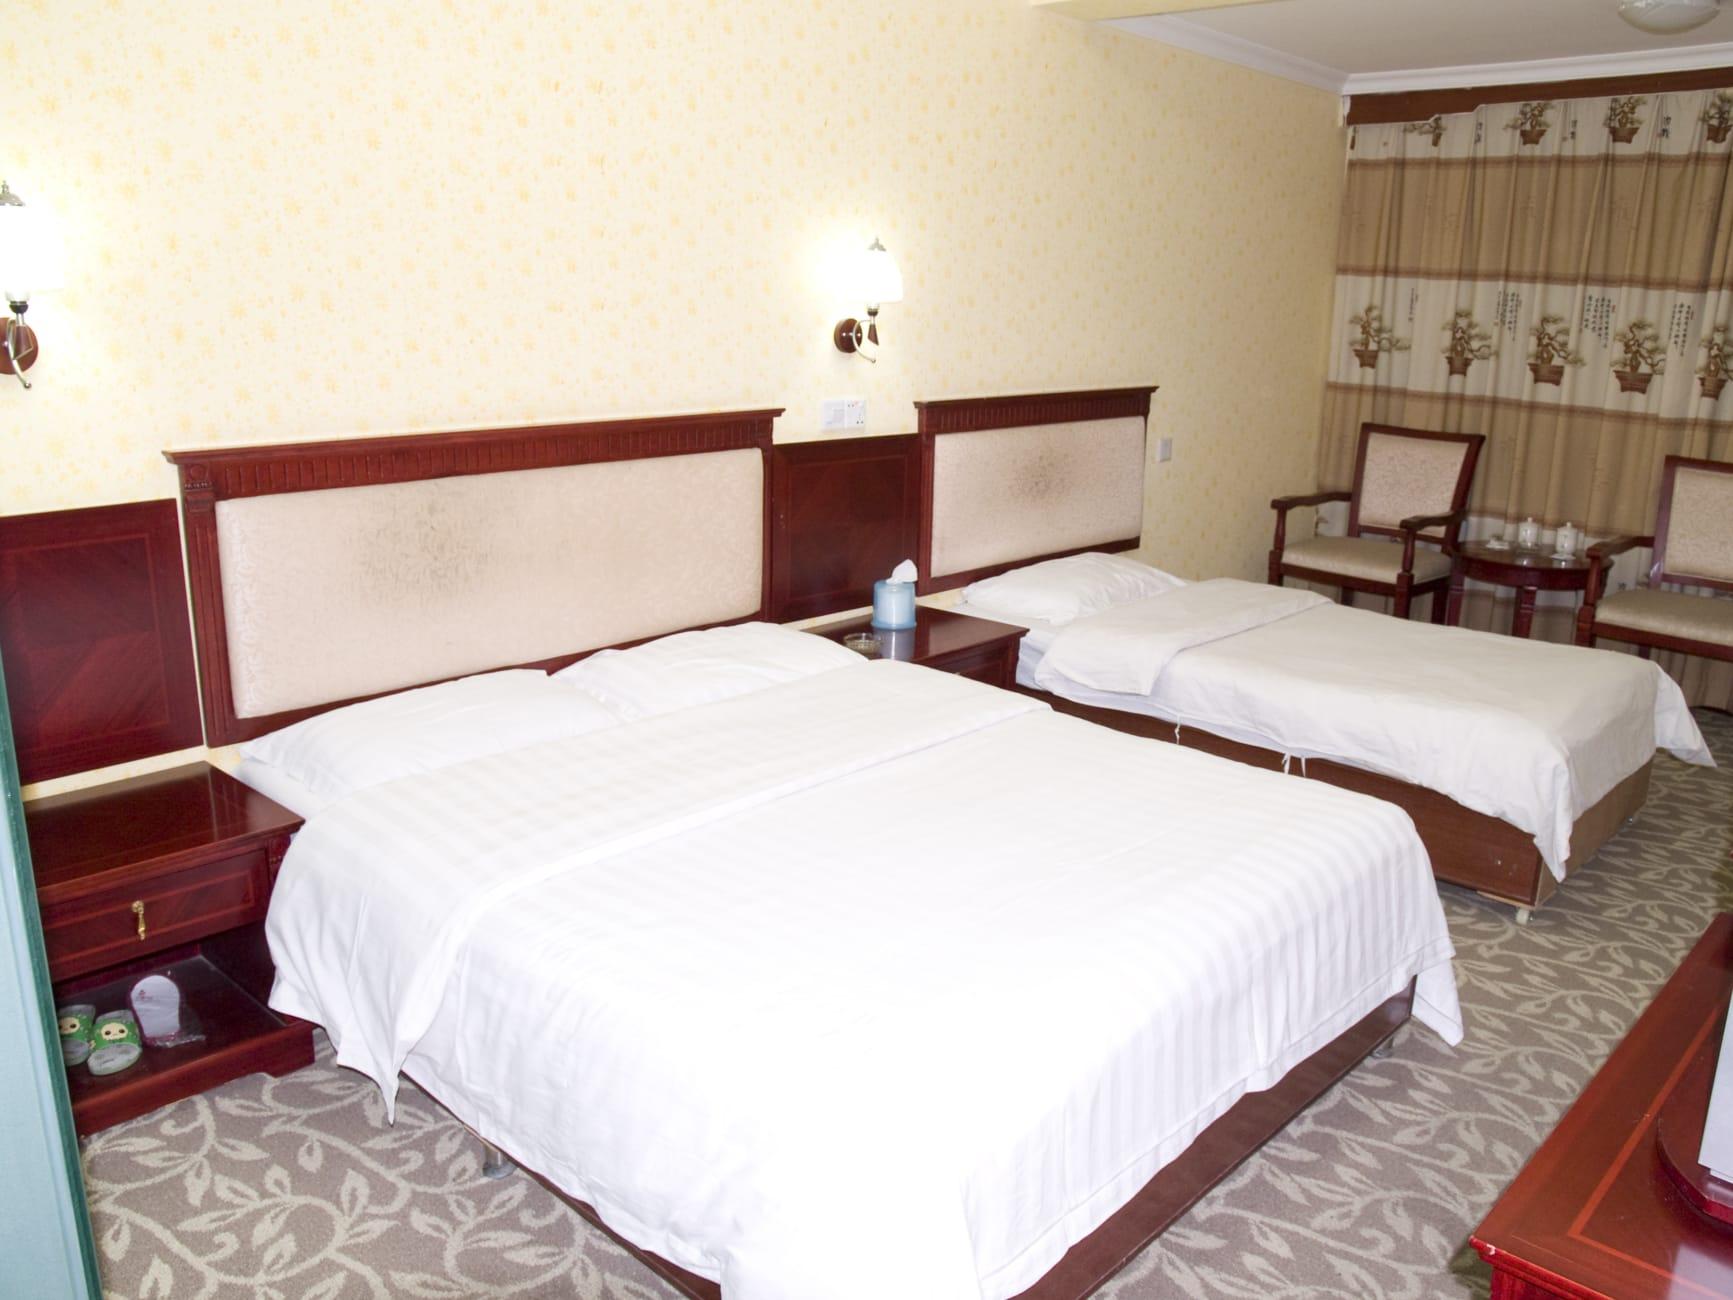 Hotel Sanyang Hotel Shenzhen Ar Trivago Com